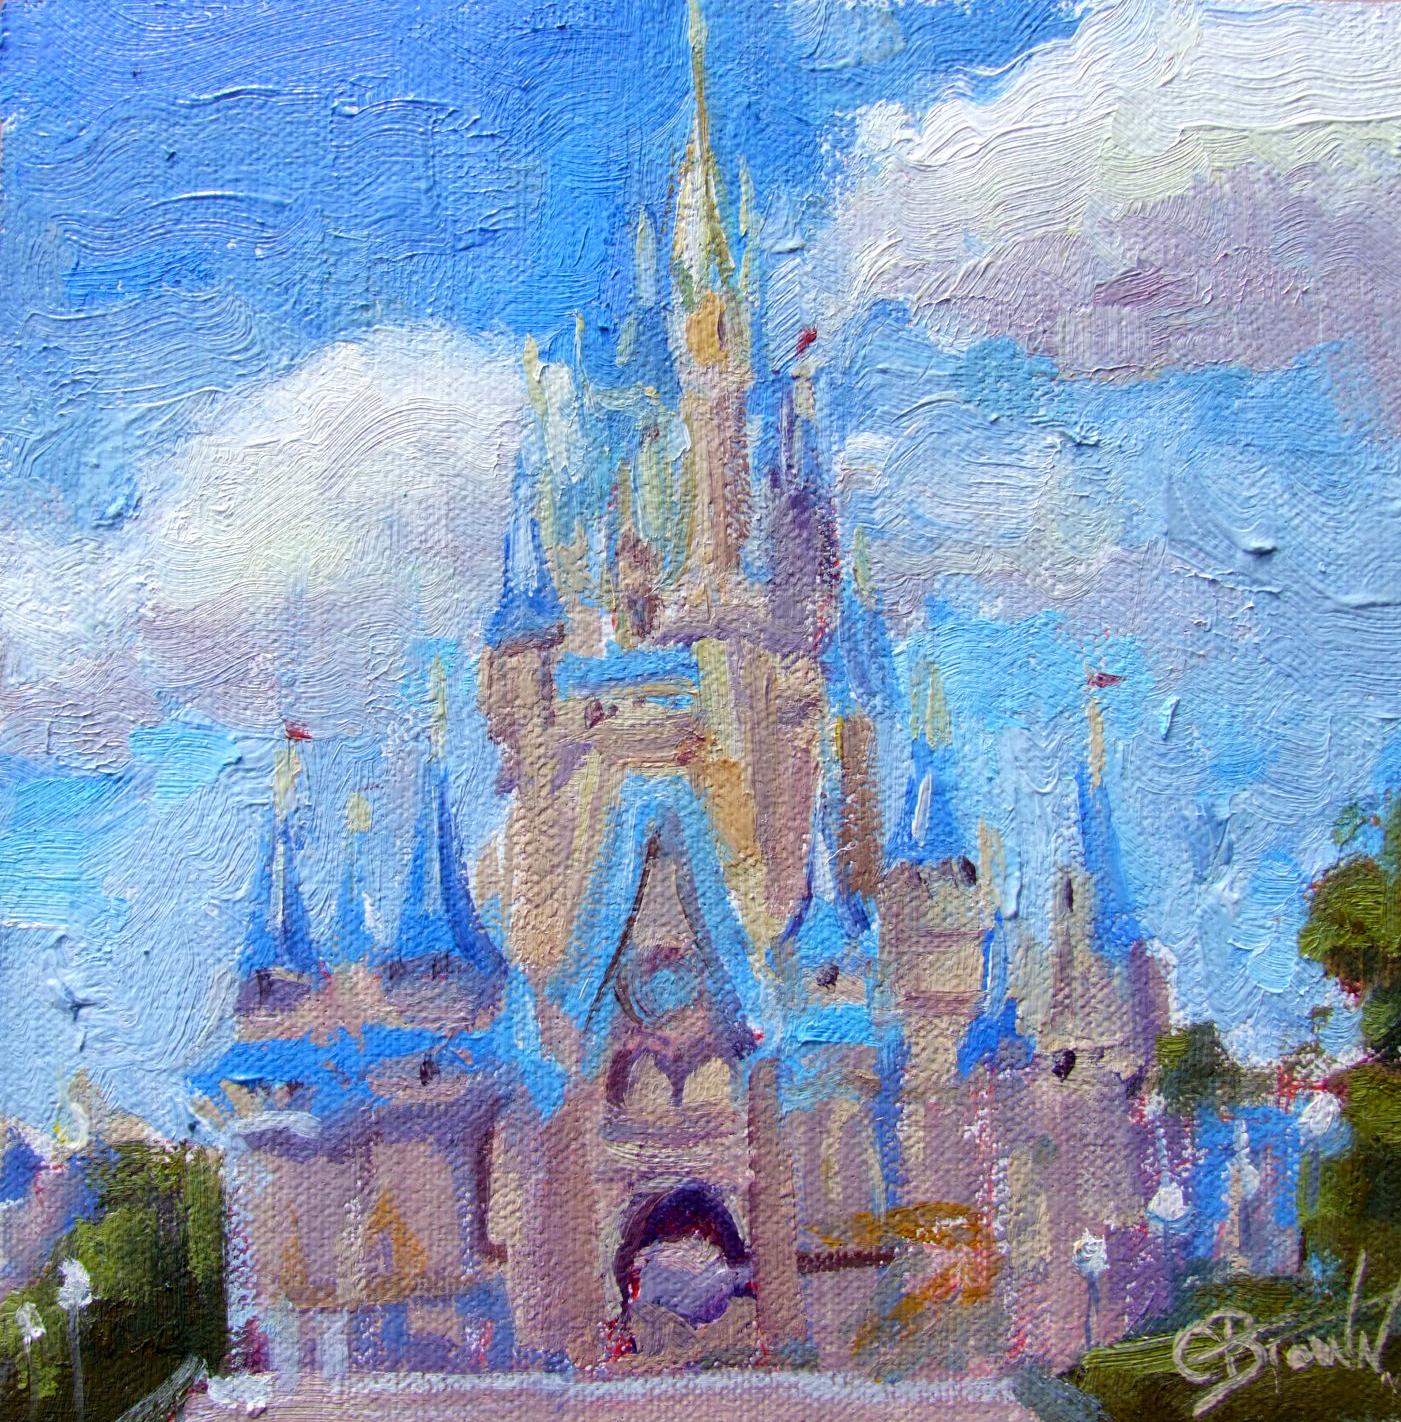 Cinderellas Castle Painting | www.imgkid.com - The Image ...